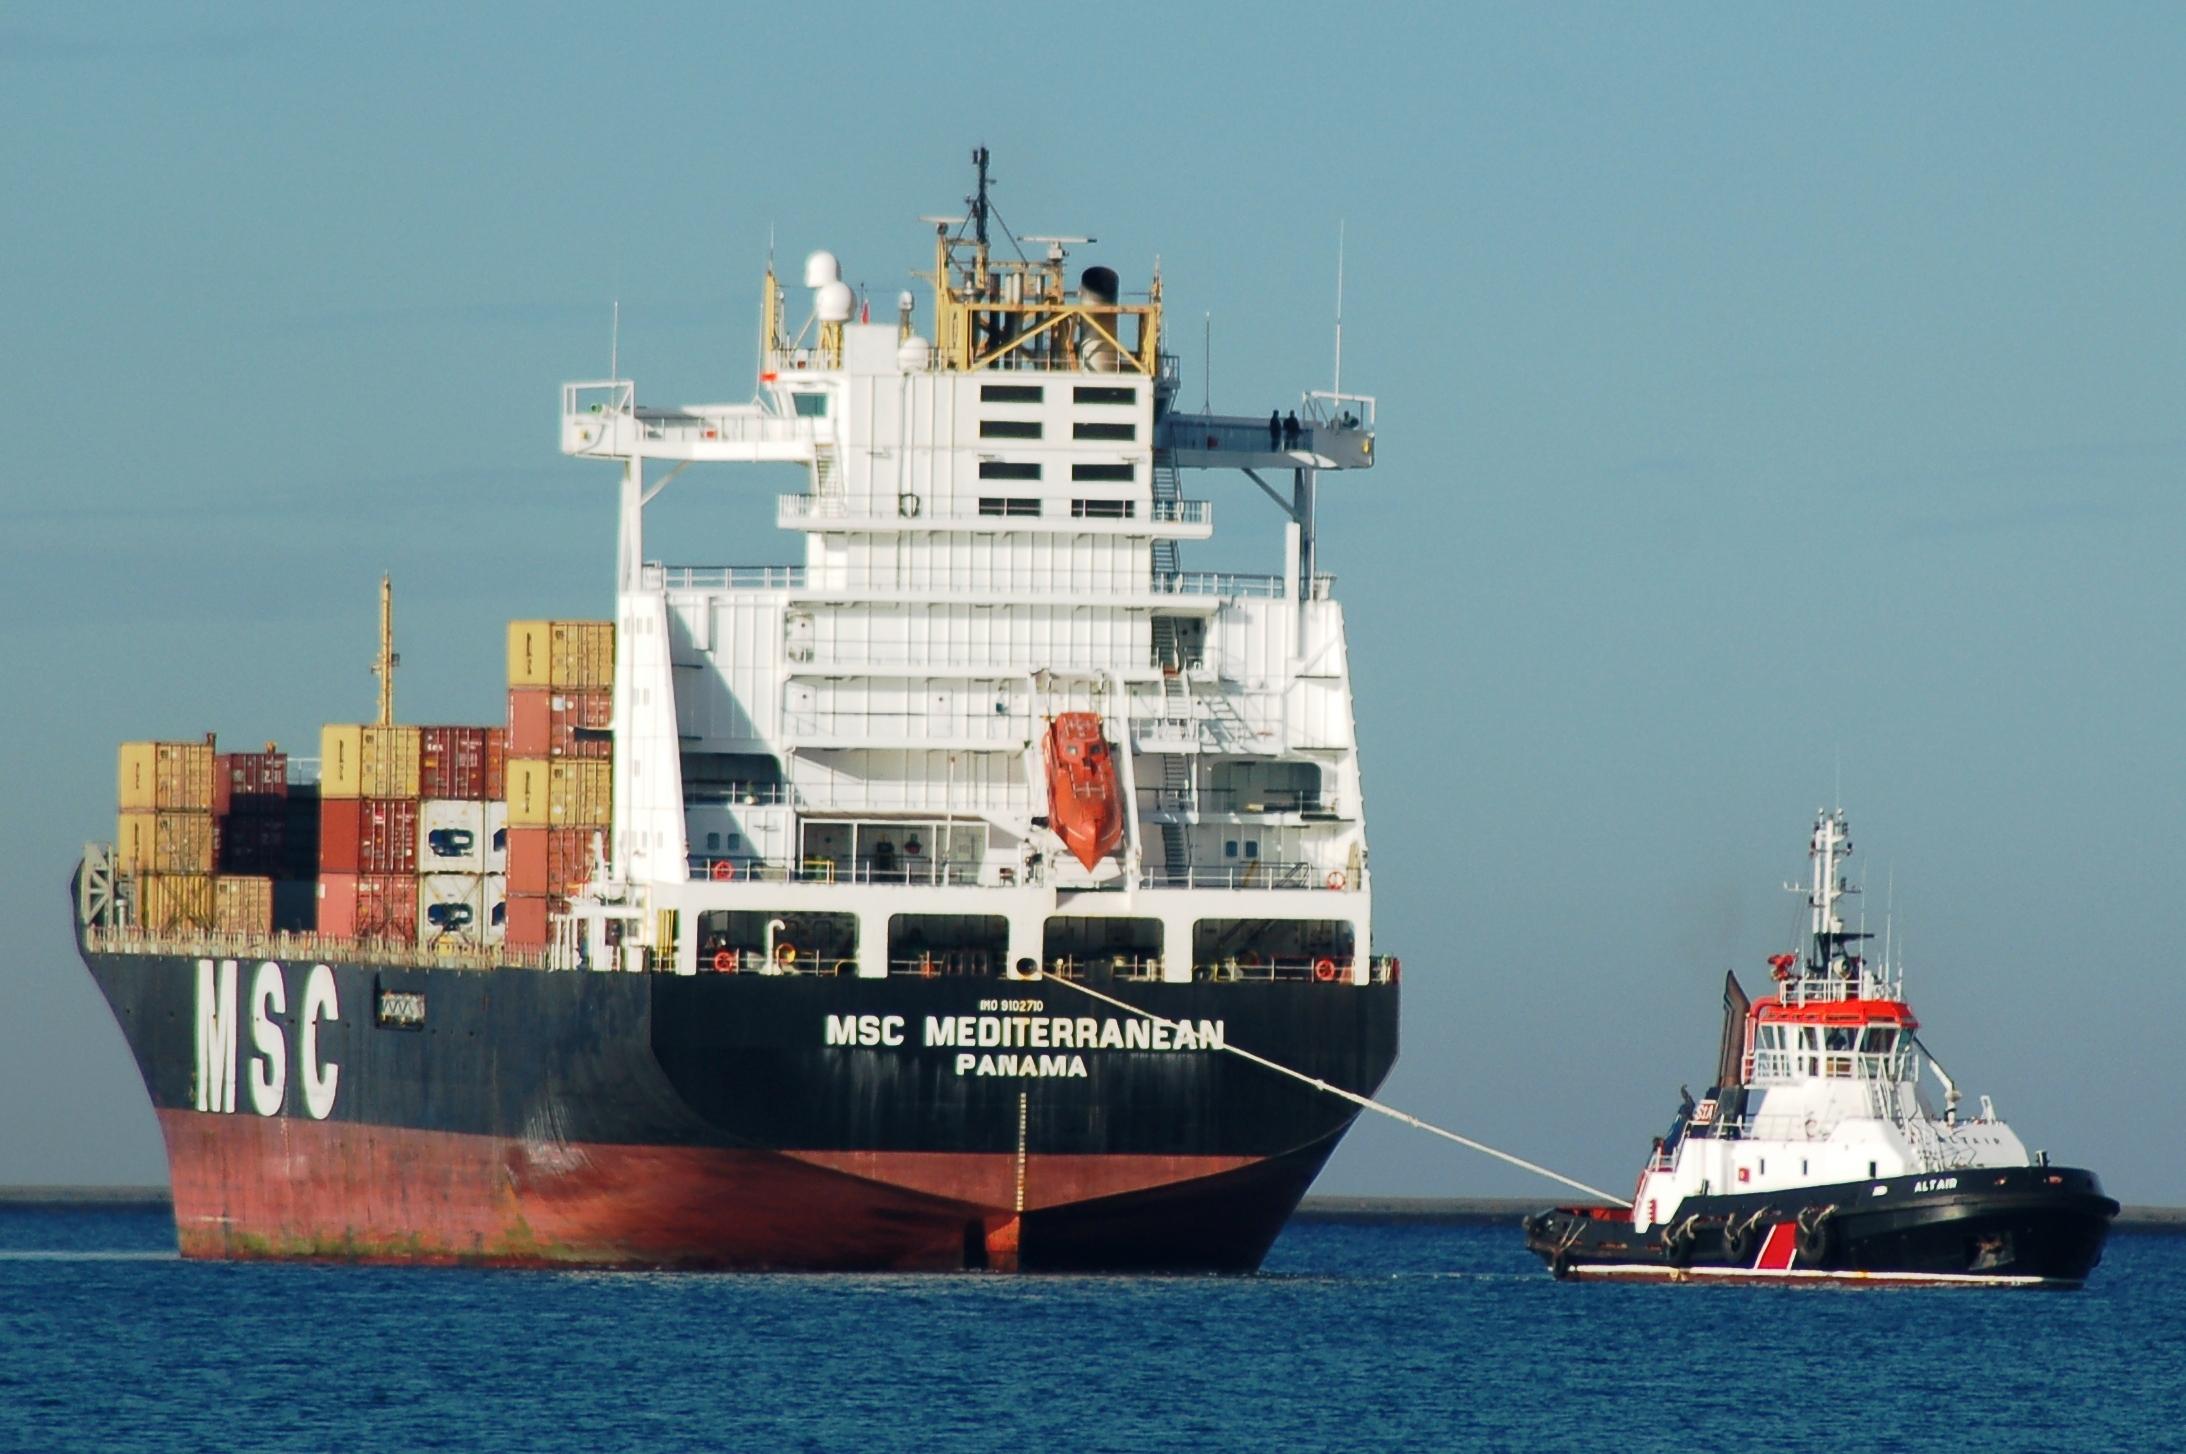 Mediterranean shipping company